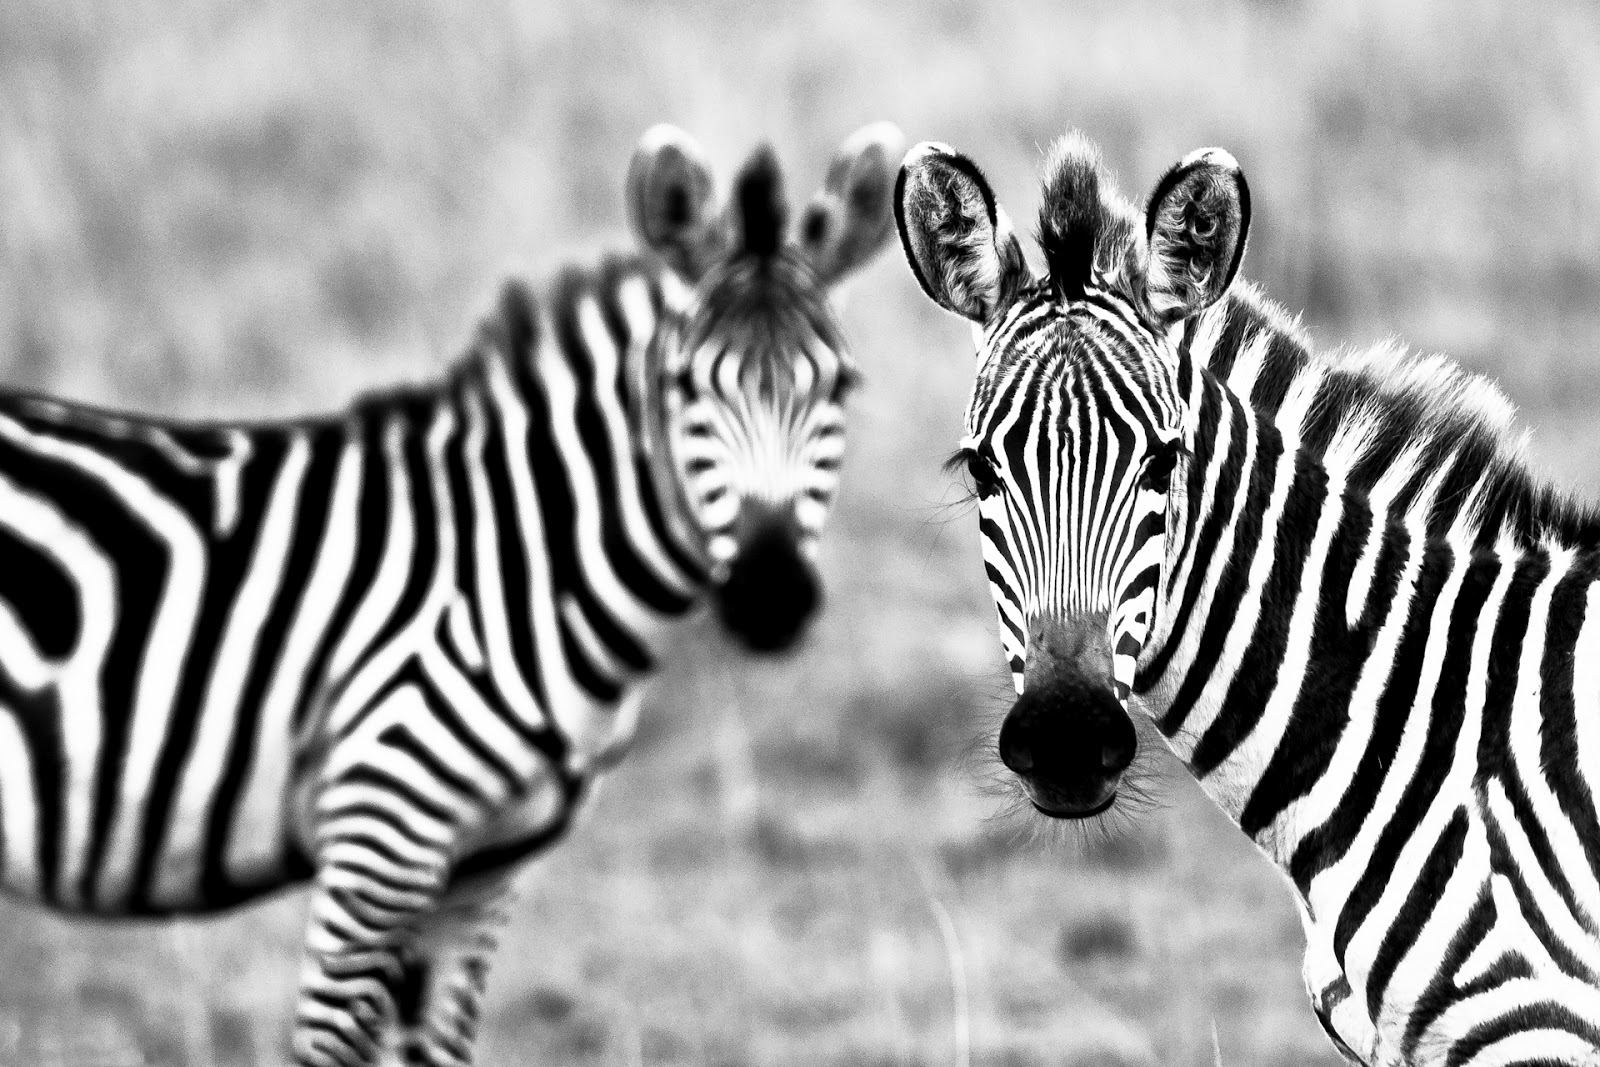 WildLife: Zebra Hd Wallpaper 2012